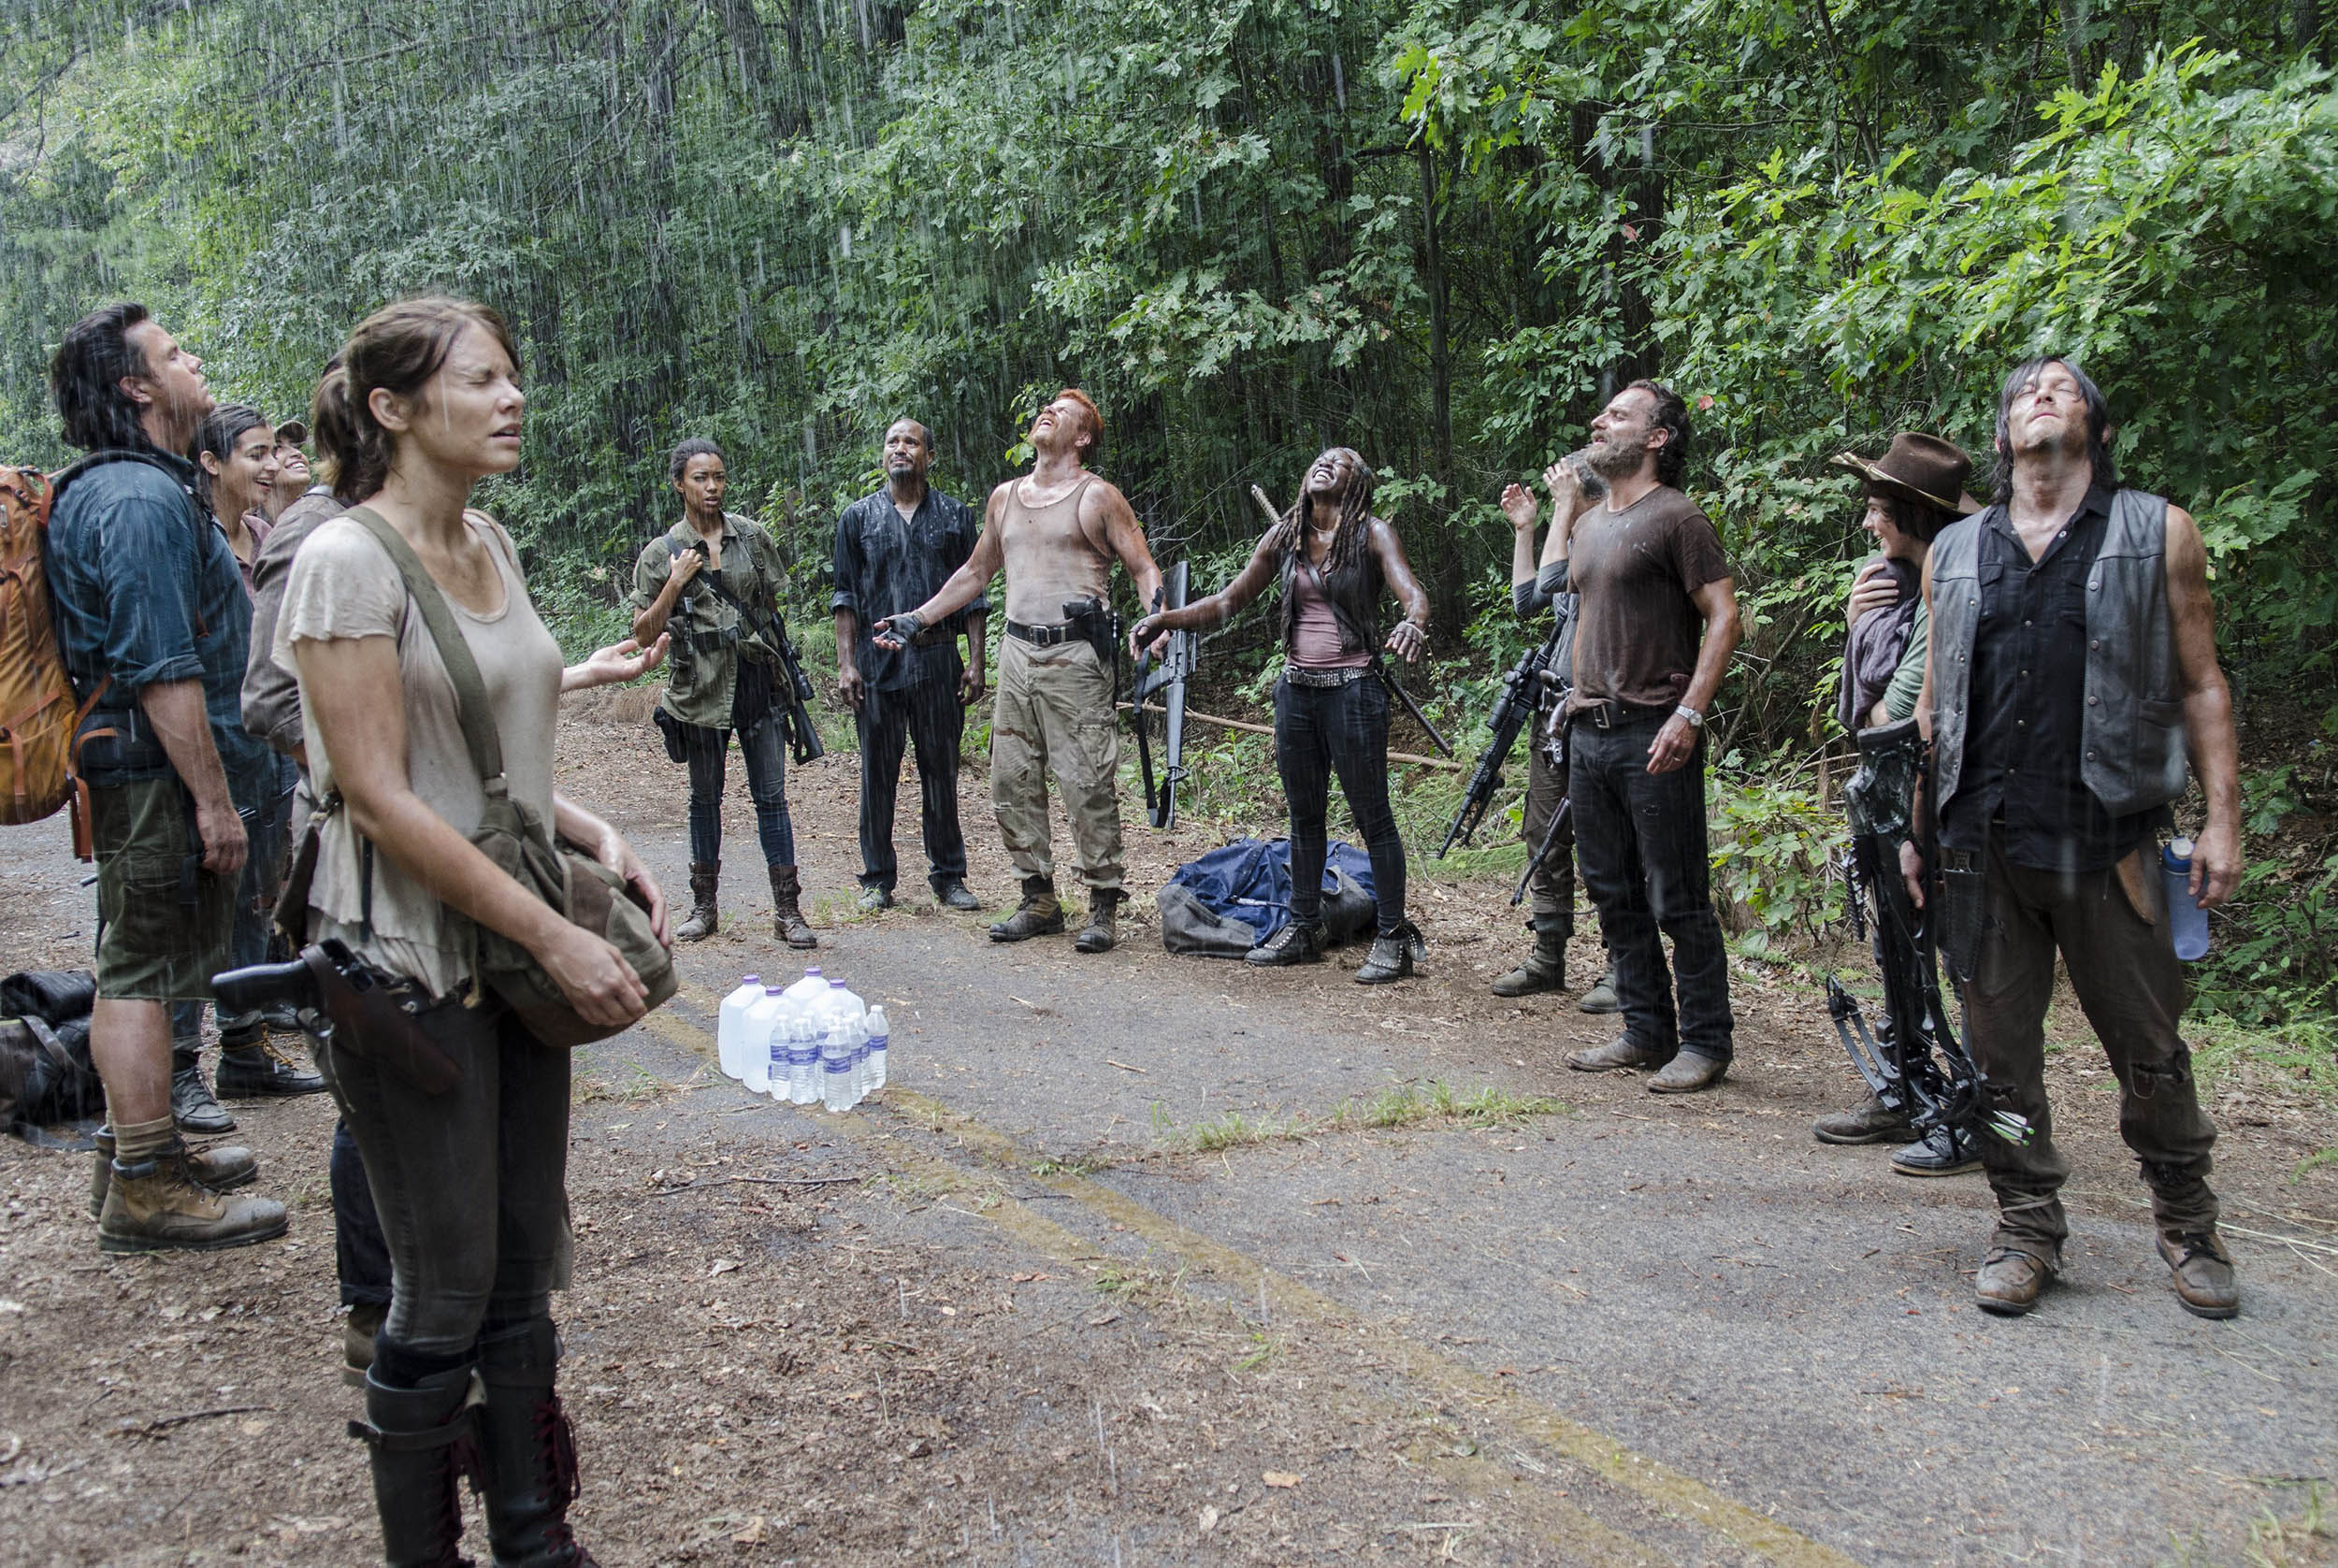 The Walking Dead, Them